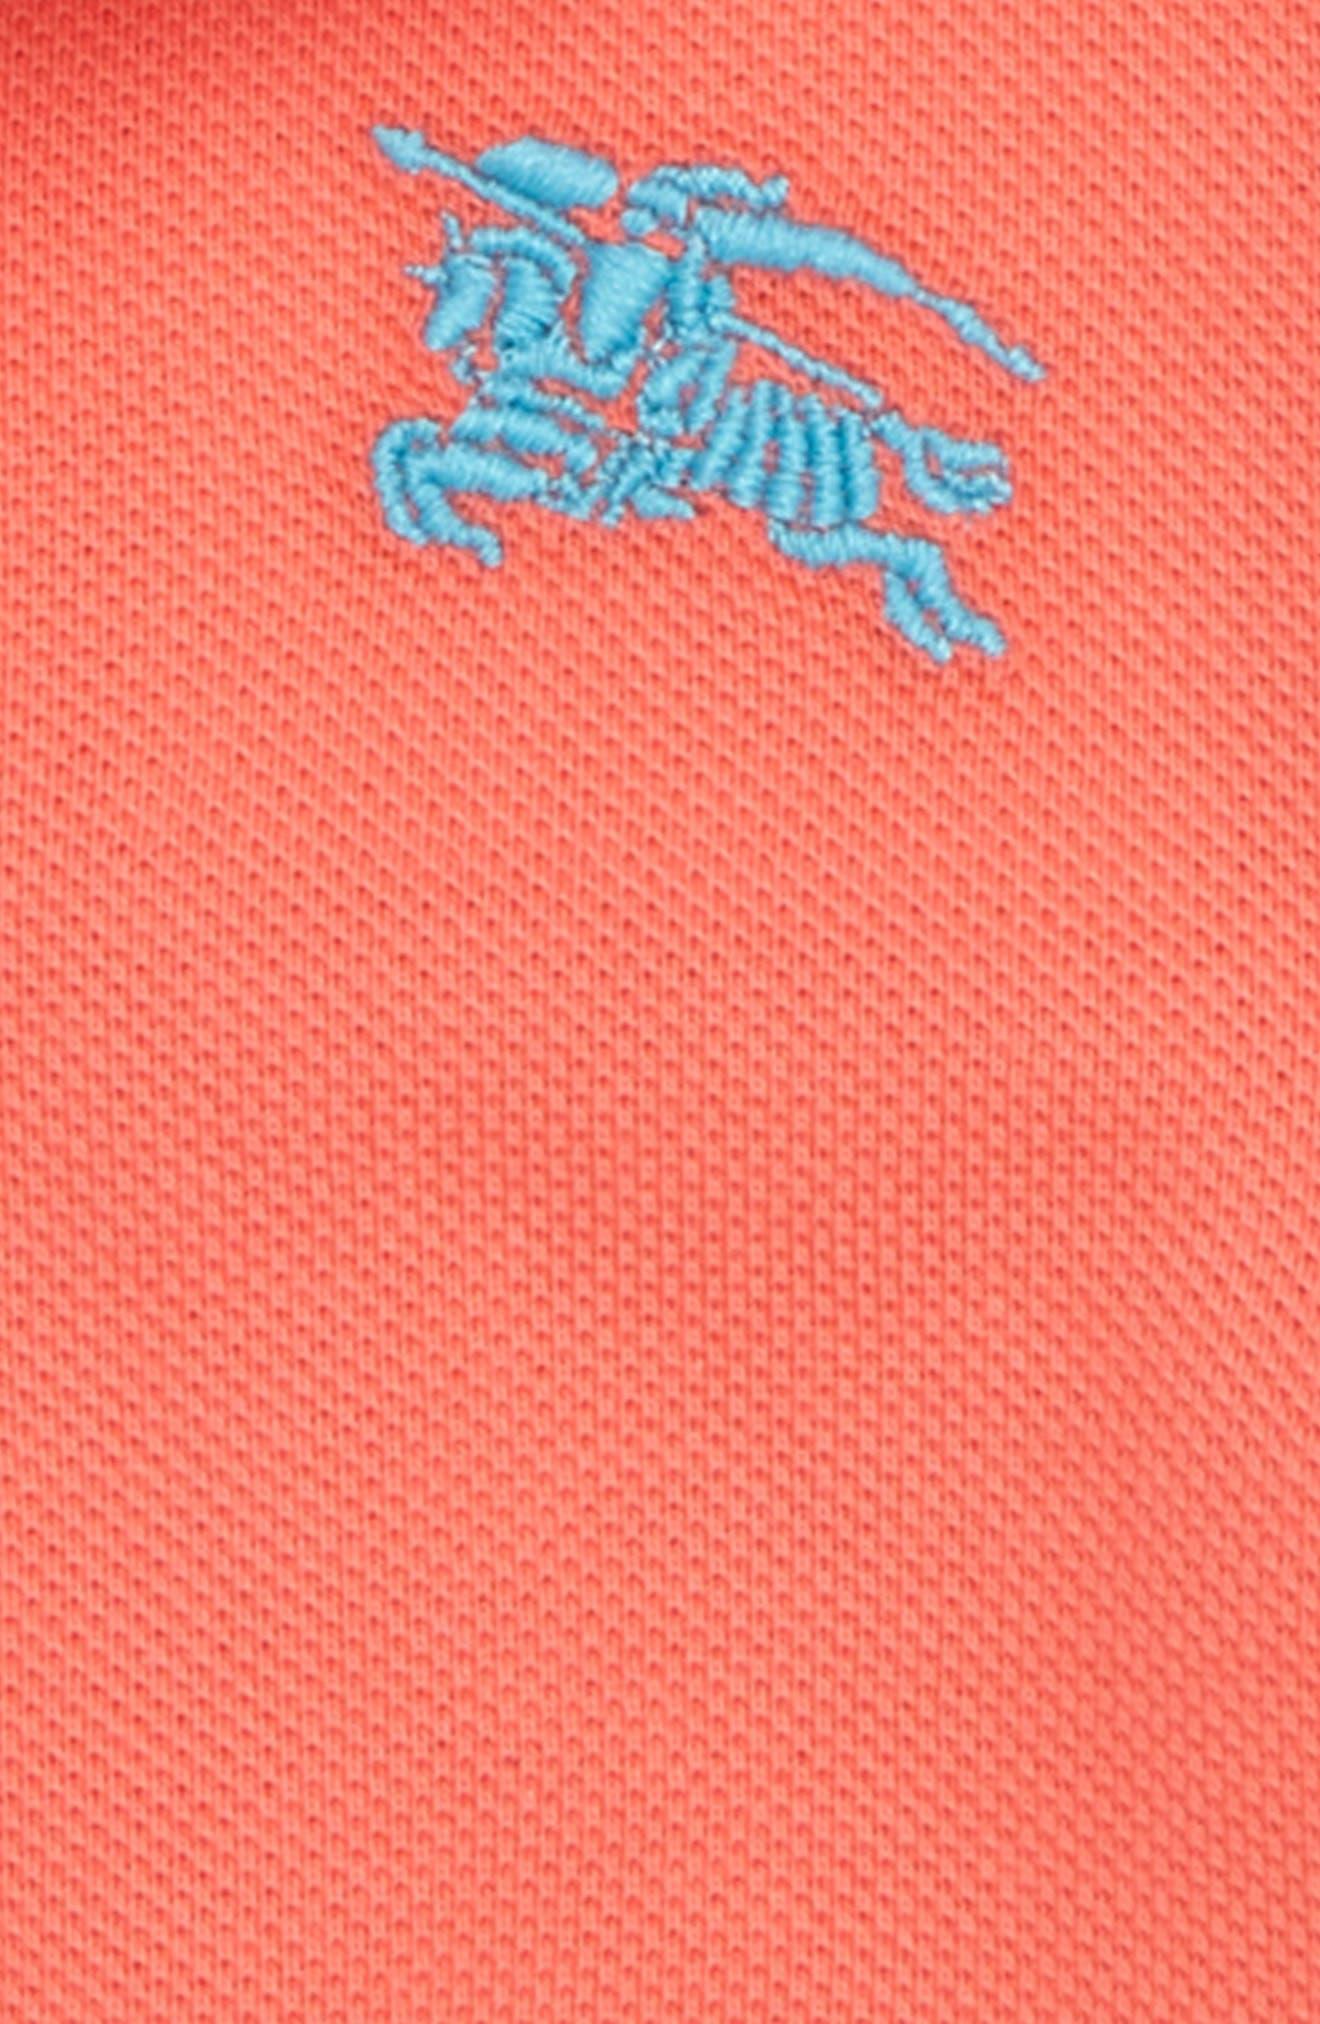 Palmer Piqué Polo,                             Alternate thumbnail 2, color,                             BRIGHT CORAL PINK